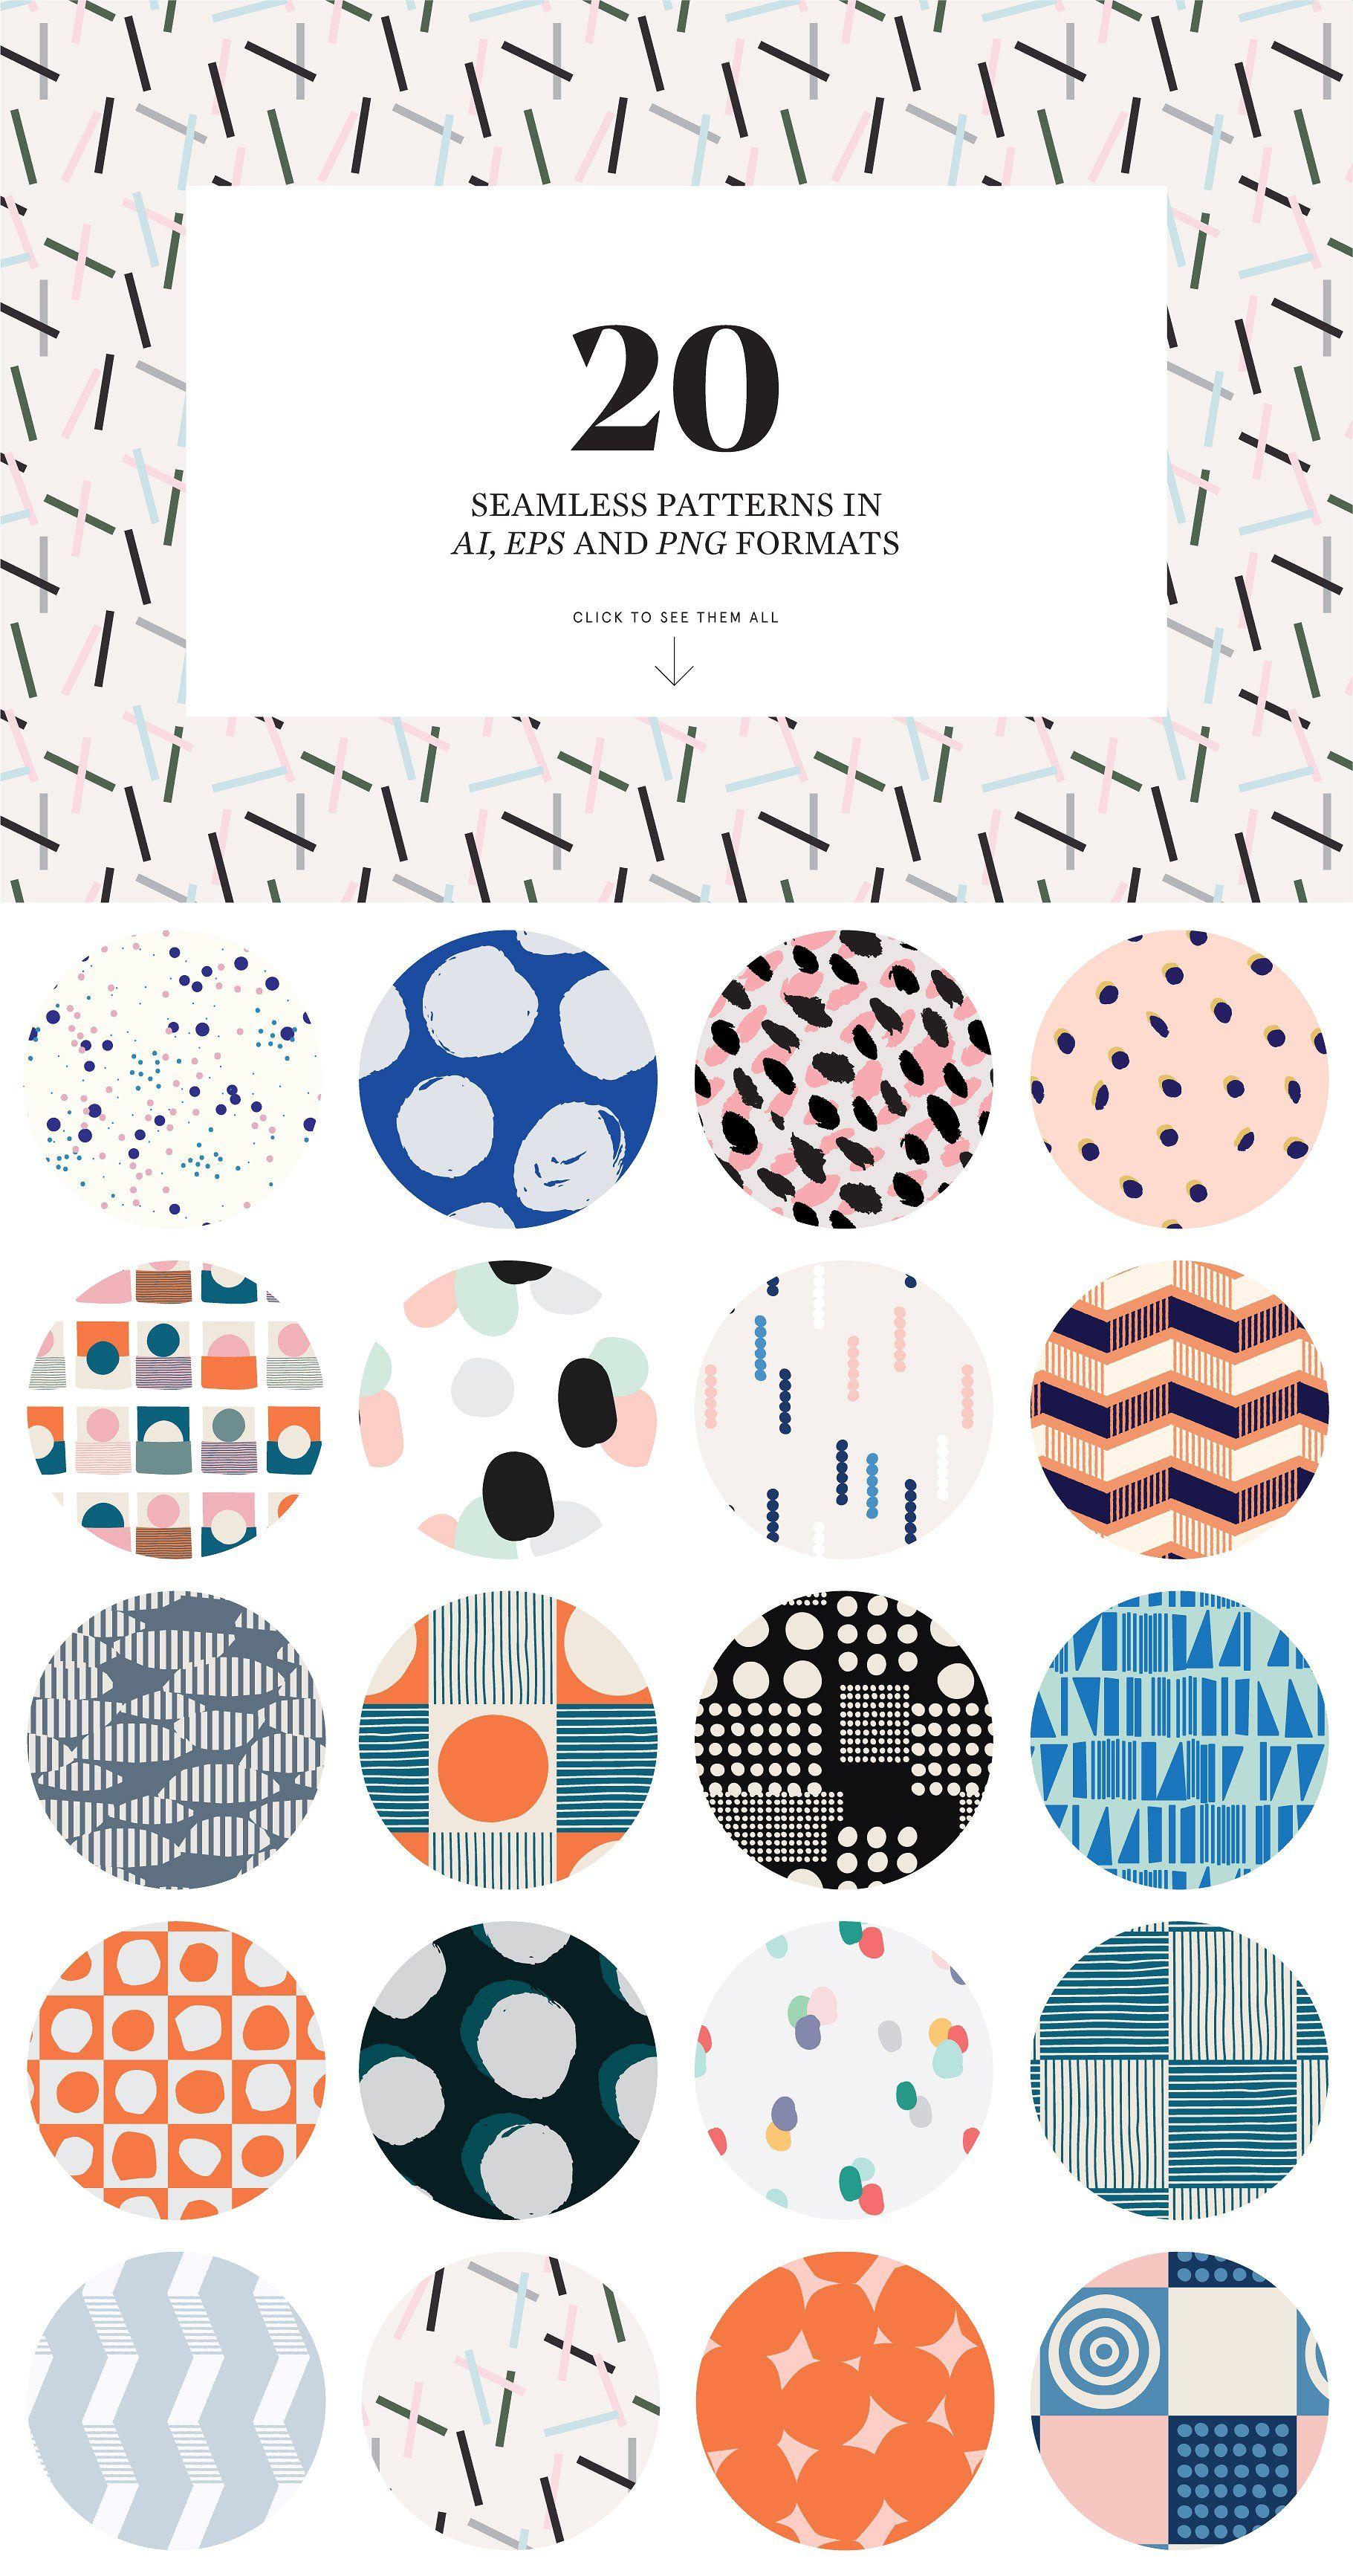 Abstract Scandinavian Pattern Set By Studioaurora On Creativemarket Graphic Patterns Pattern Design Inspiration Scandinavian Design Pattern